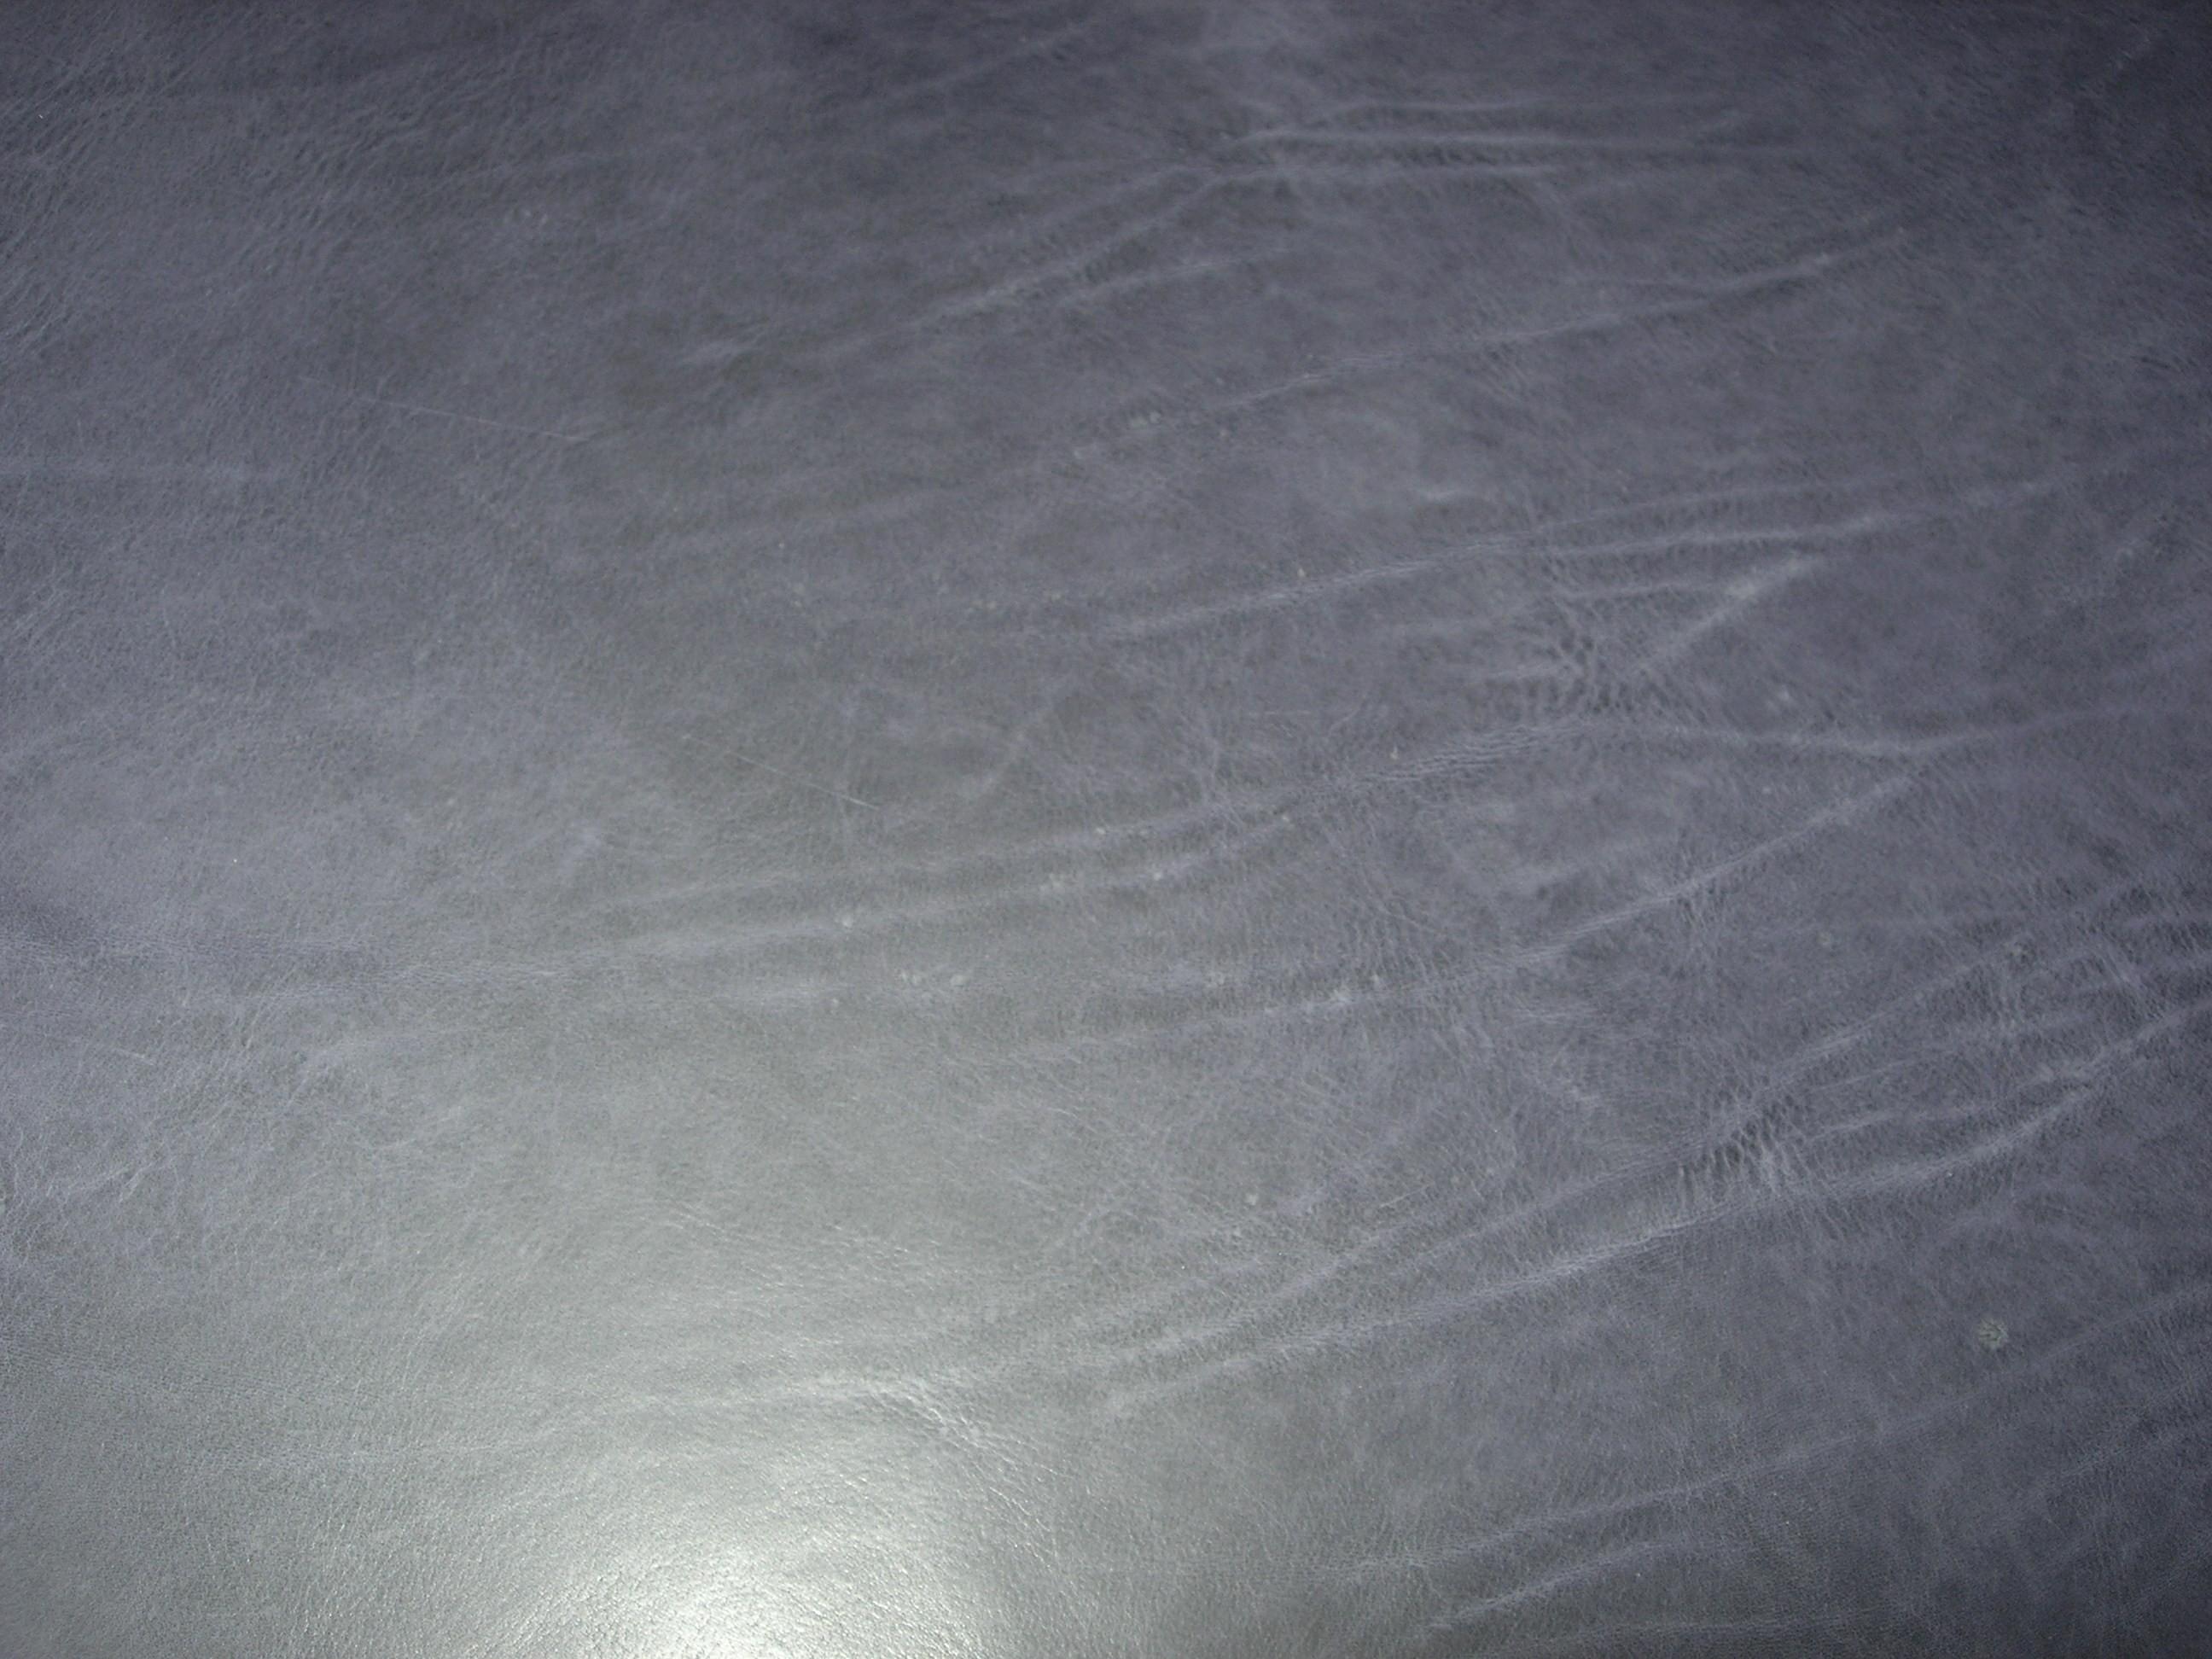 Rindhals (I) dunkelblau (E186150BL) 2,6-2,8mm.